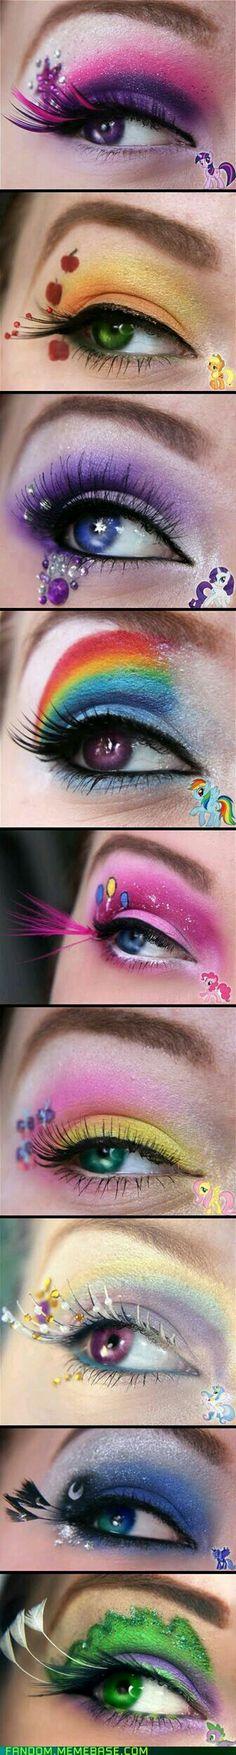 Maquiagem My little pony !